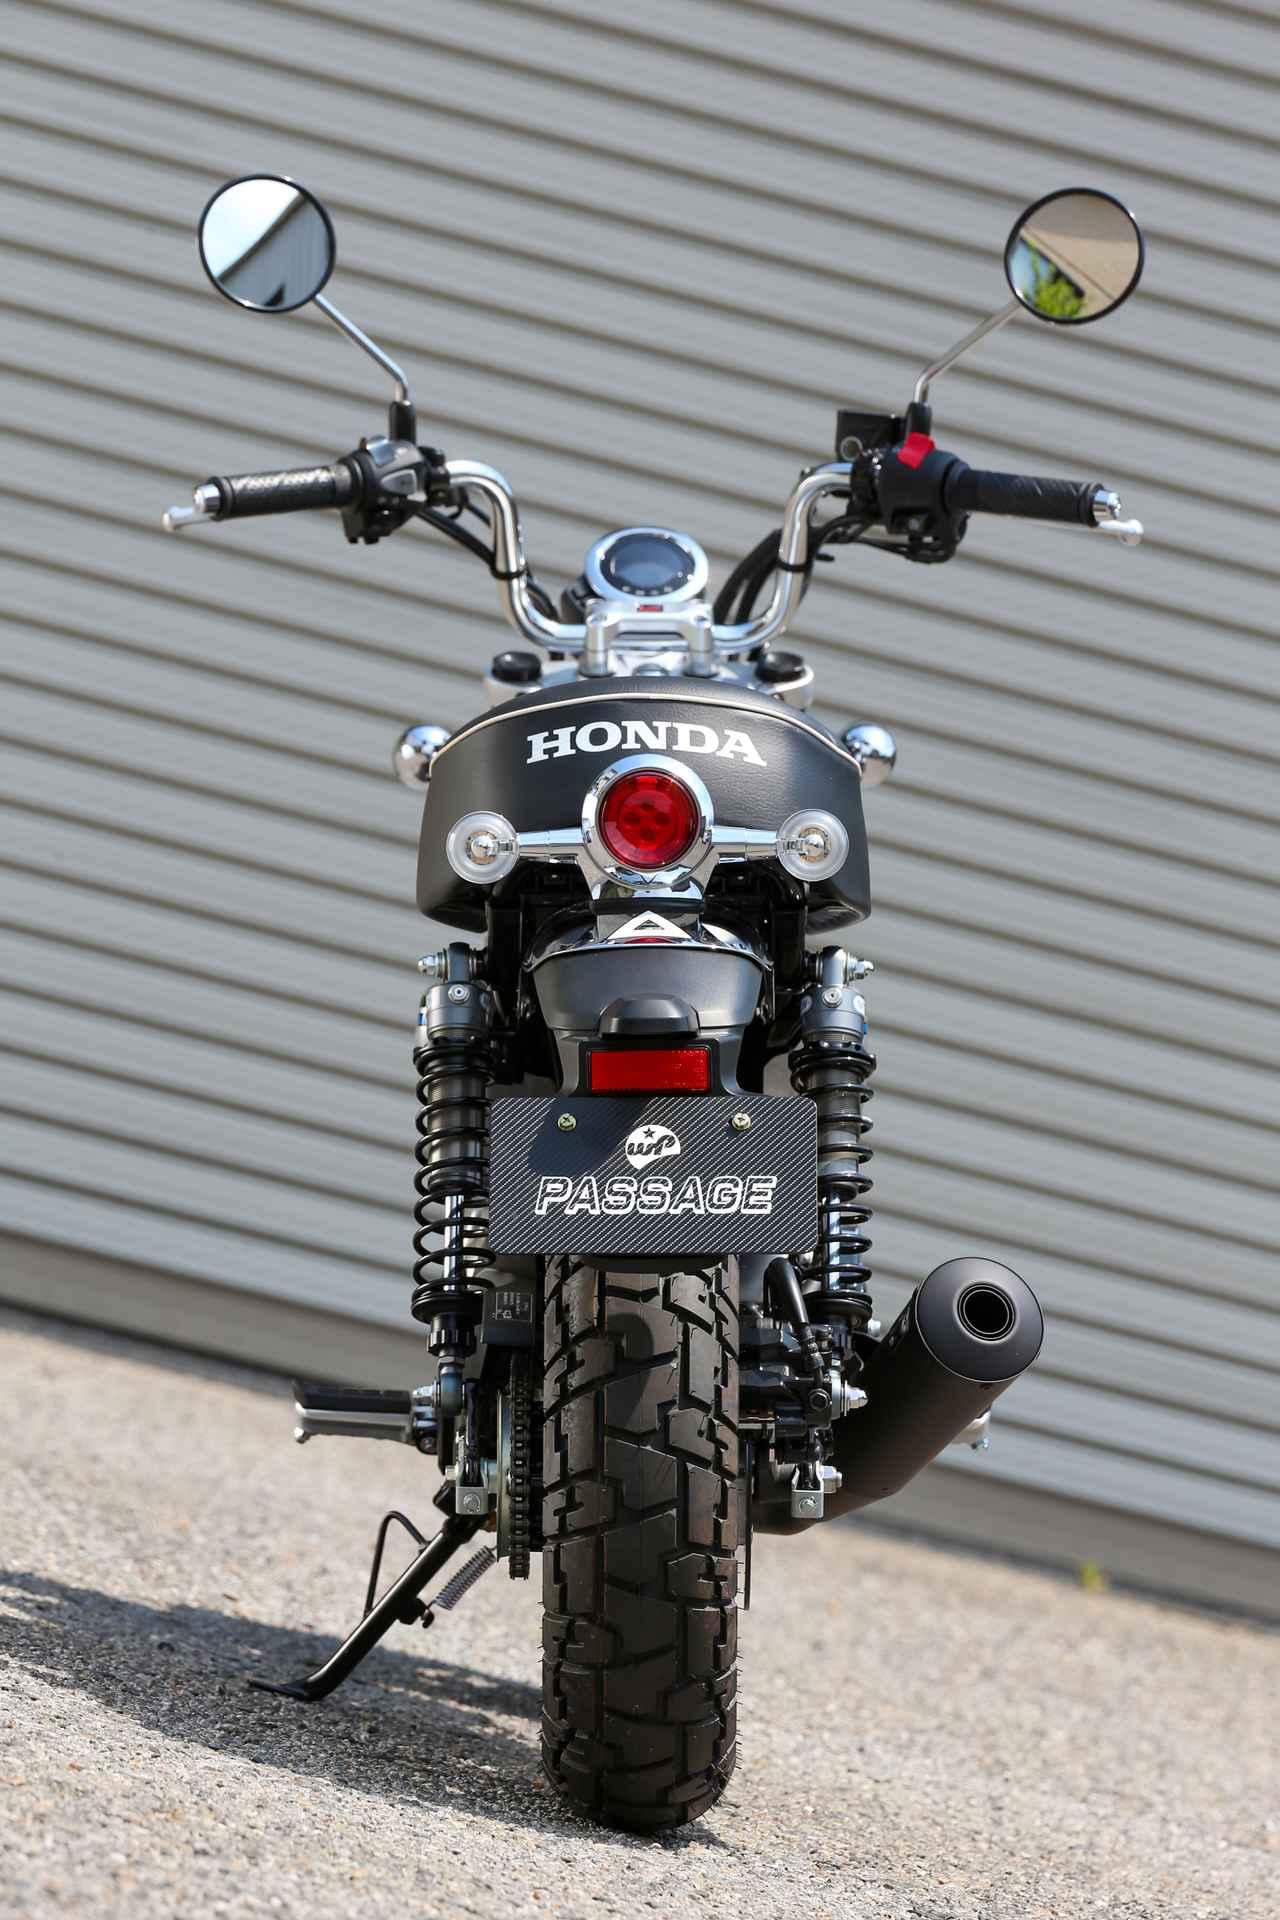 Images : 10番目の画像 - 気になるモンキーFSの写真をもっと見る! - LAWRENCE - Motorcycle x Cars + α = Your Life.